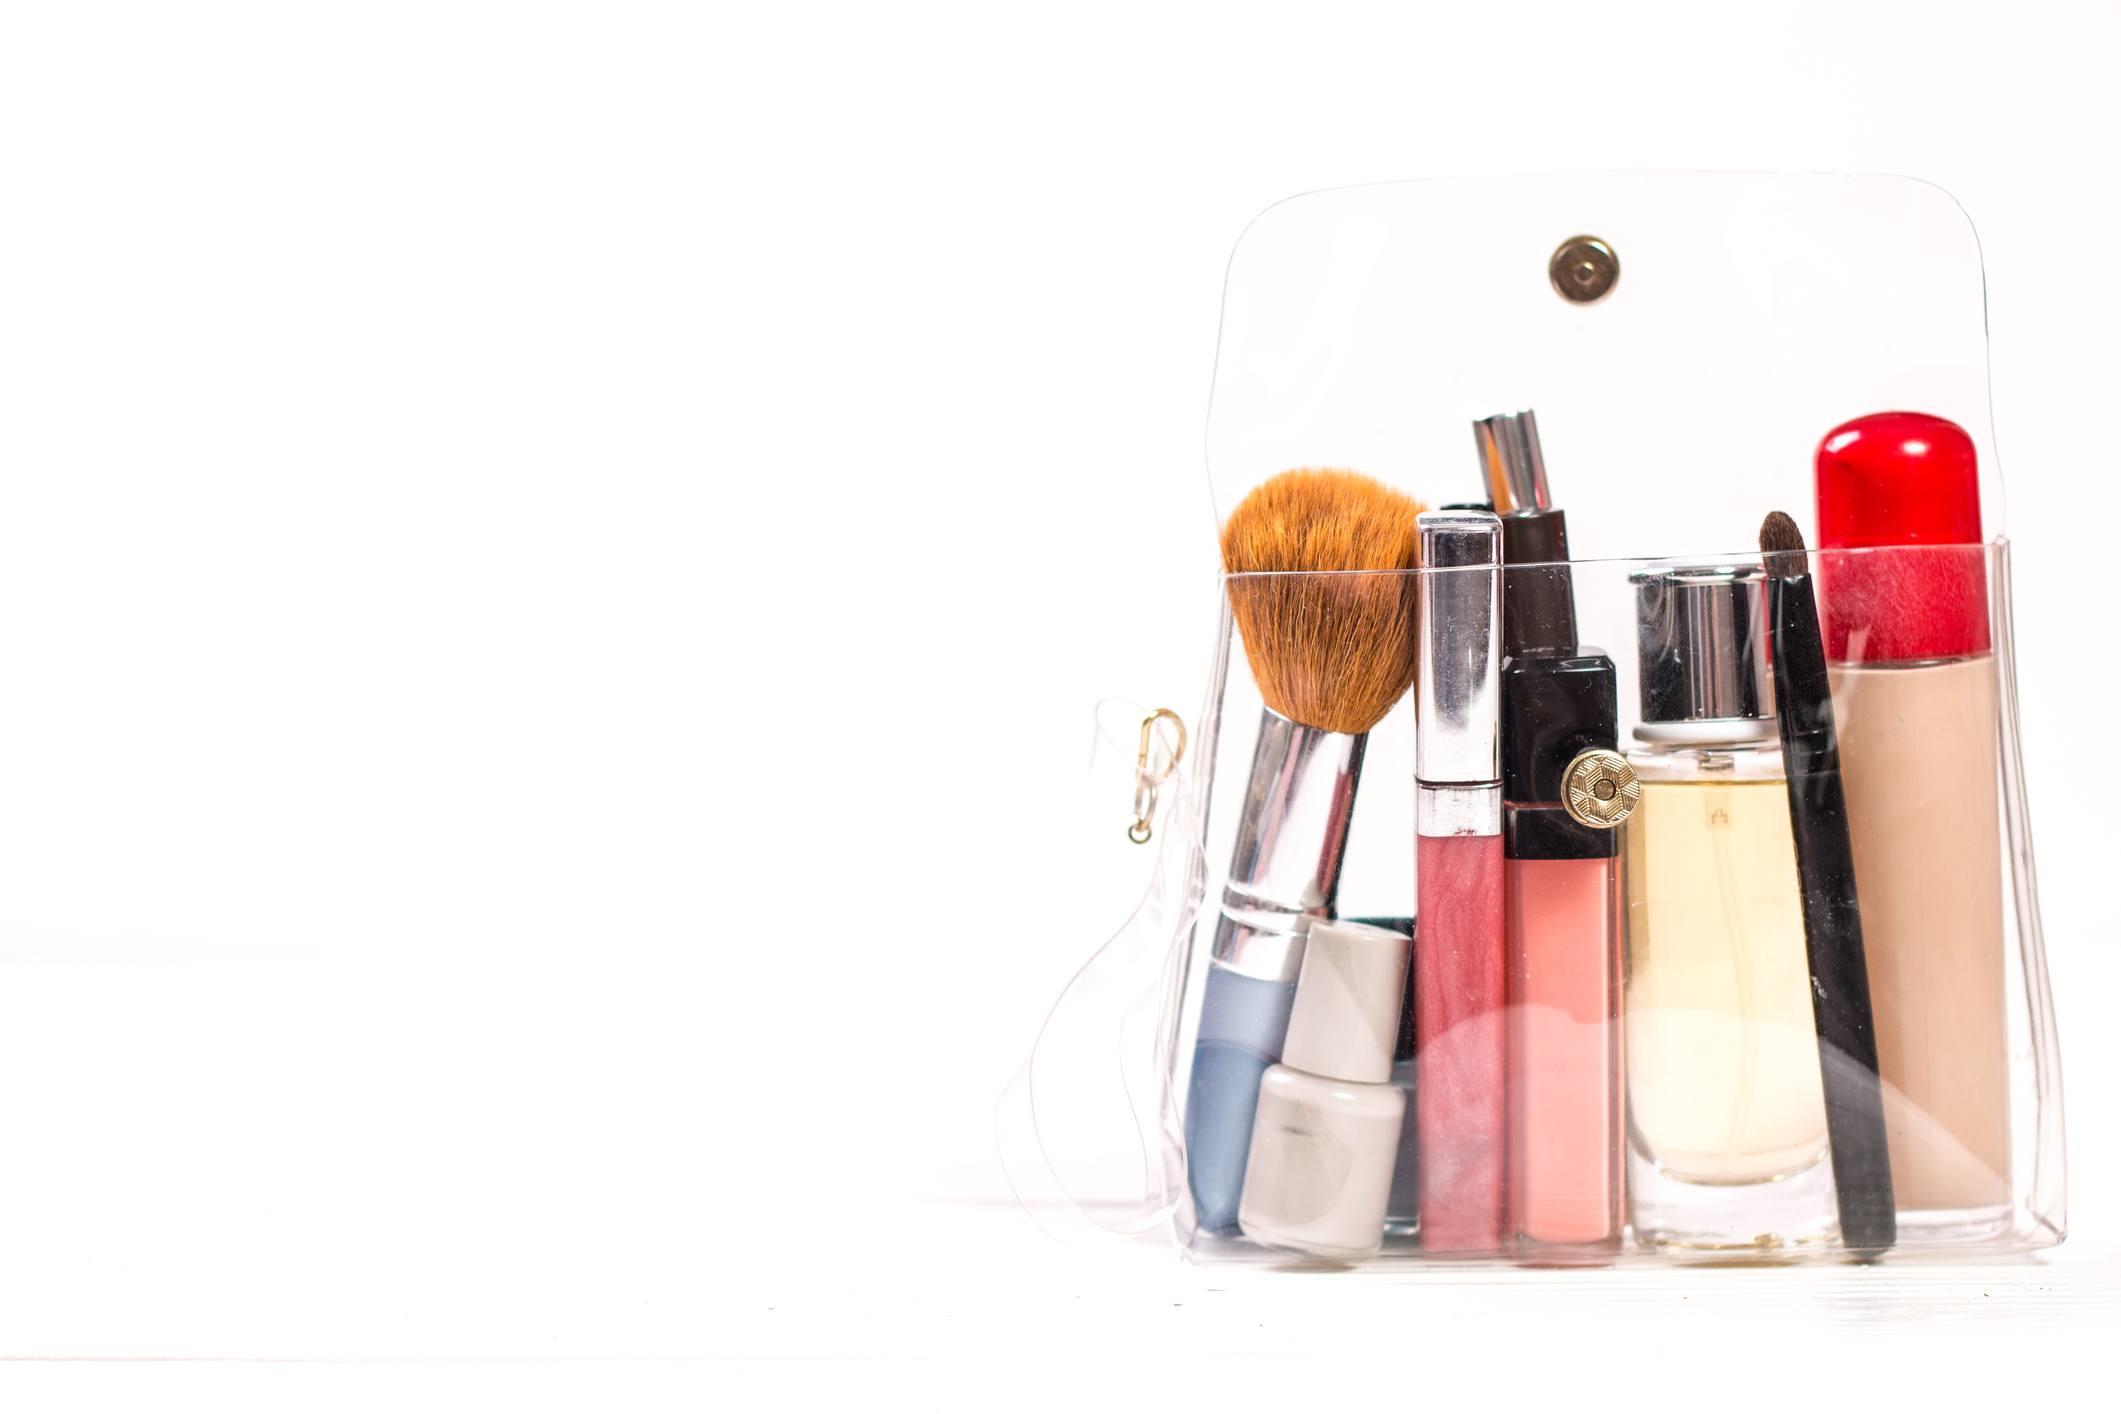 A bag full of makeup